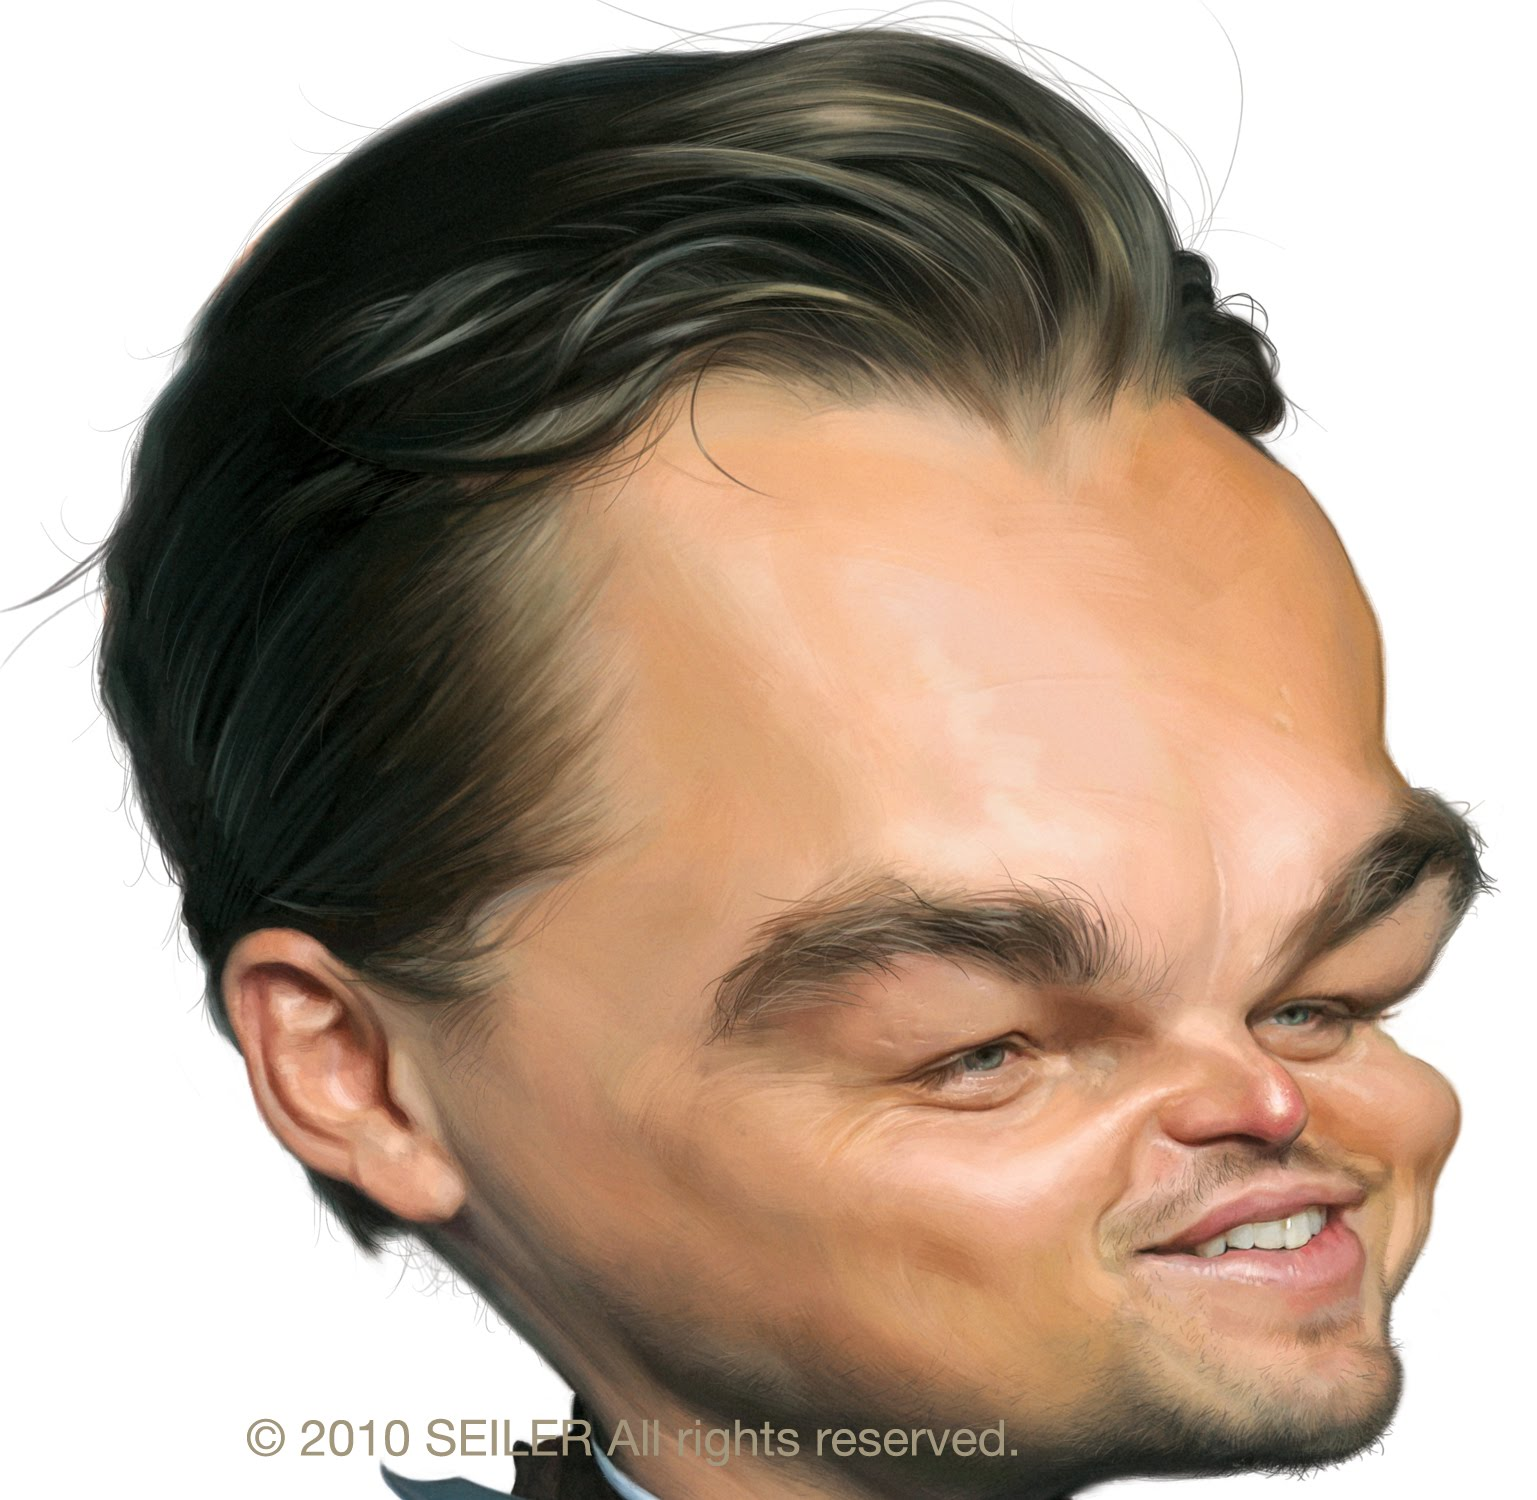 http://2.bp.blogspot.com/_VFdUDzTjekQ/TFnbmTHVzRI/AAAAAAAACkM/AKSwFvBD5FY/s1600/leonardo_head.jpg